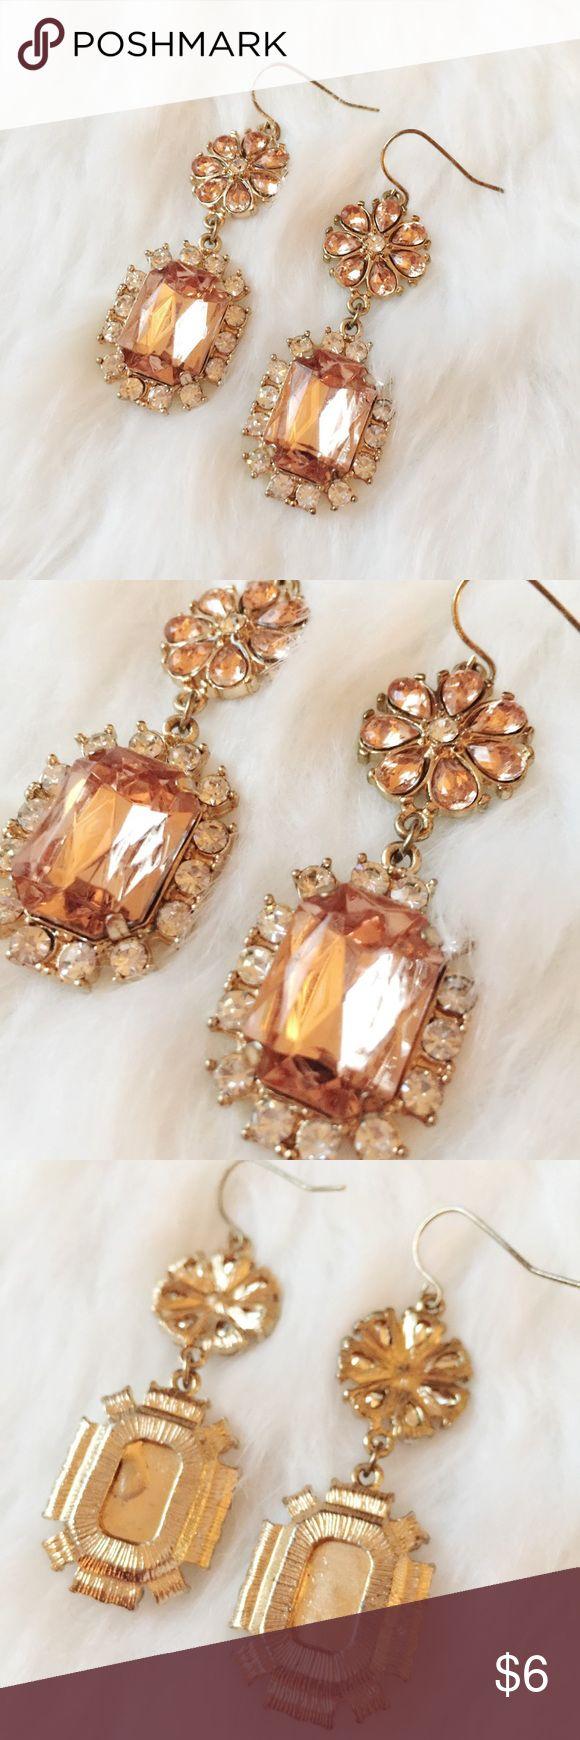 Forever21 Gold Diamond Dangle Earrings Beautiful gold dangle earrings  Worn one or twice.  Been cleaned. Forever 21 Jewelry Earrings